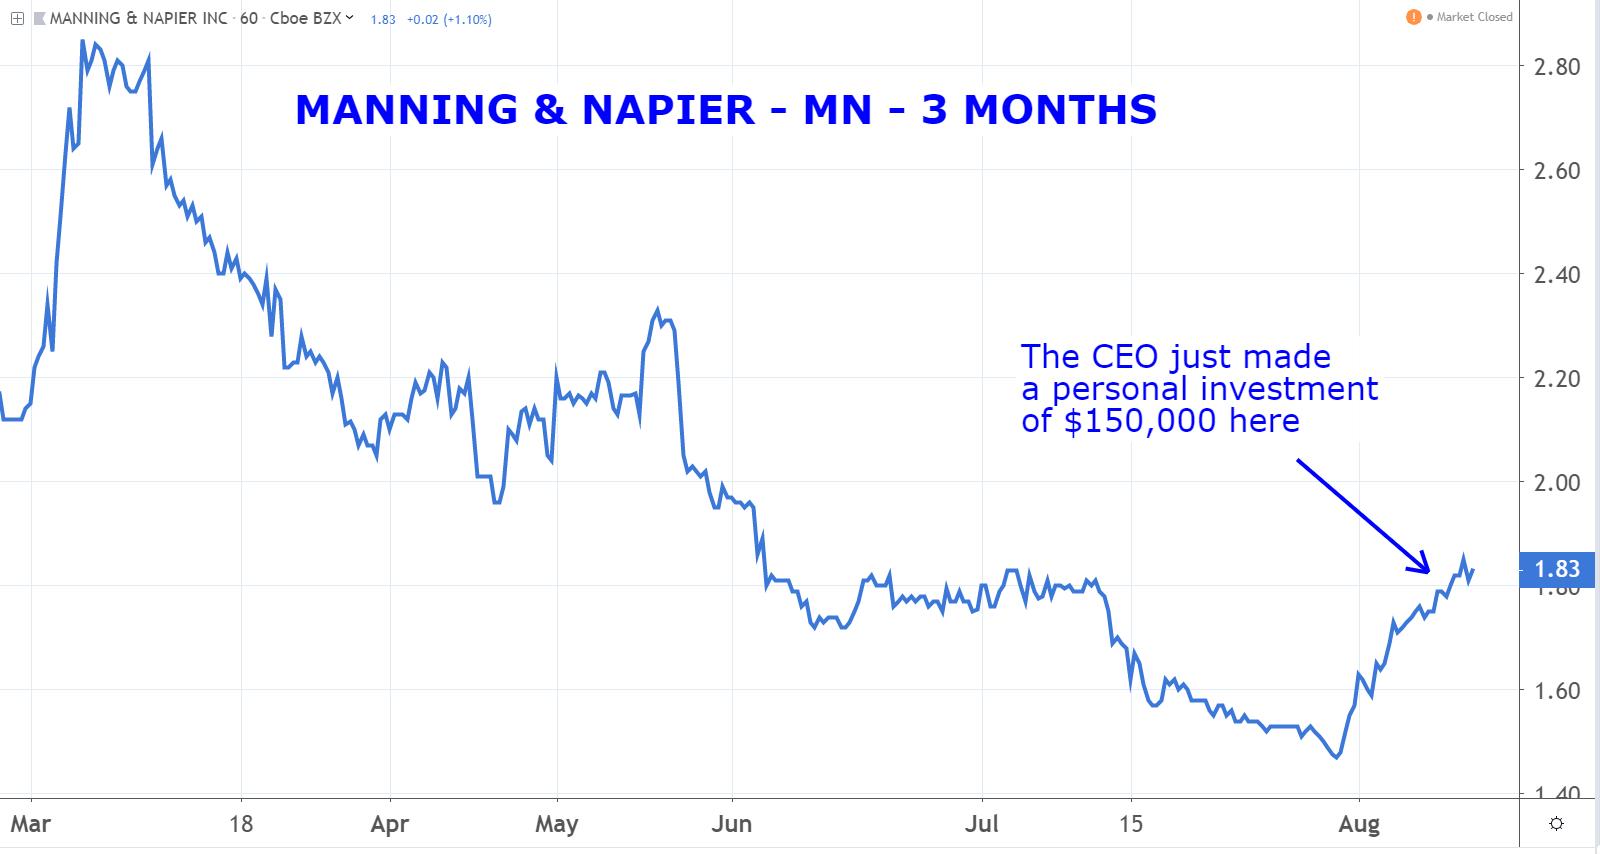 Stocks to Buy: Manning & Napier (MN)